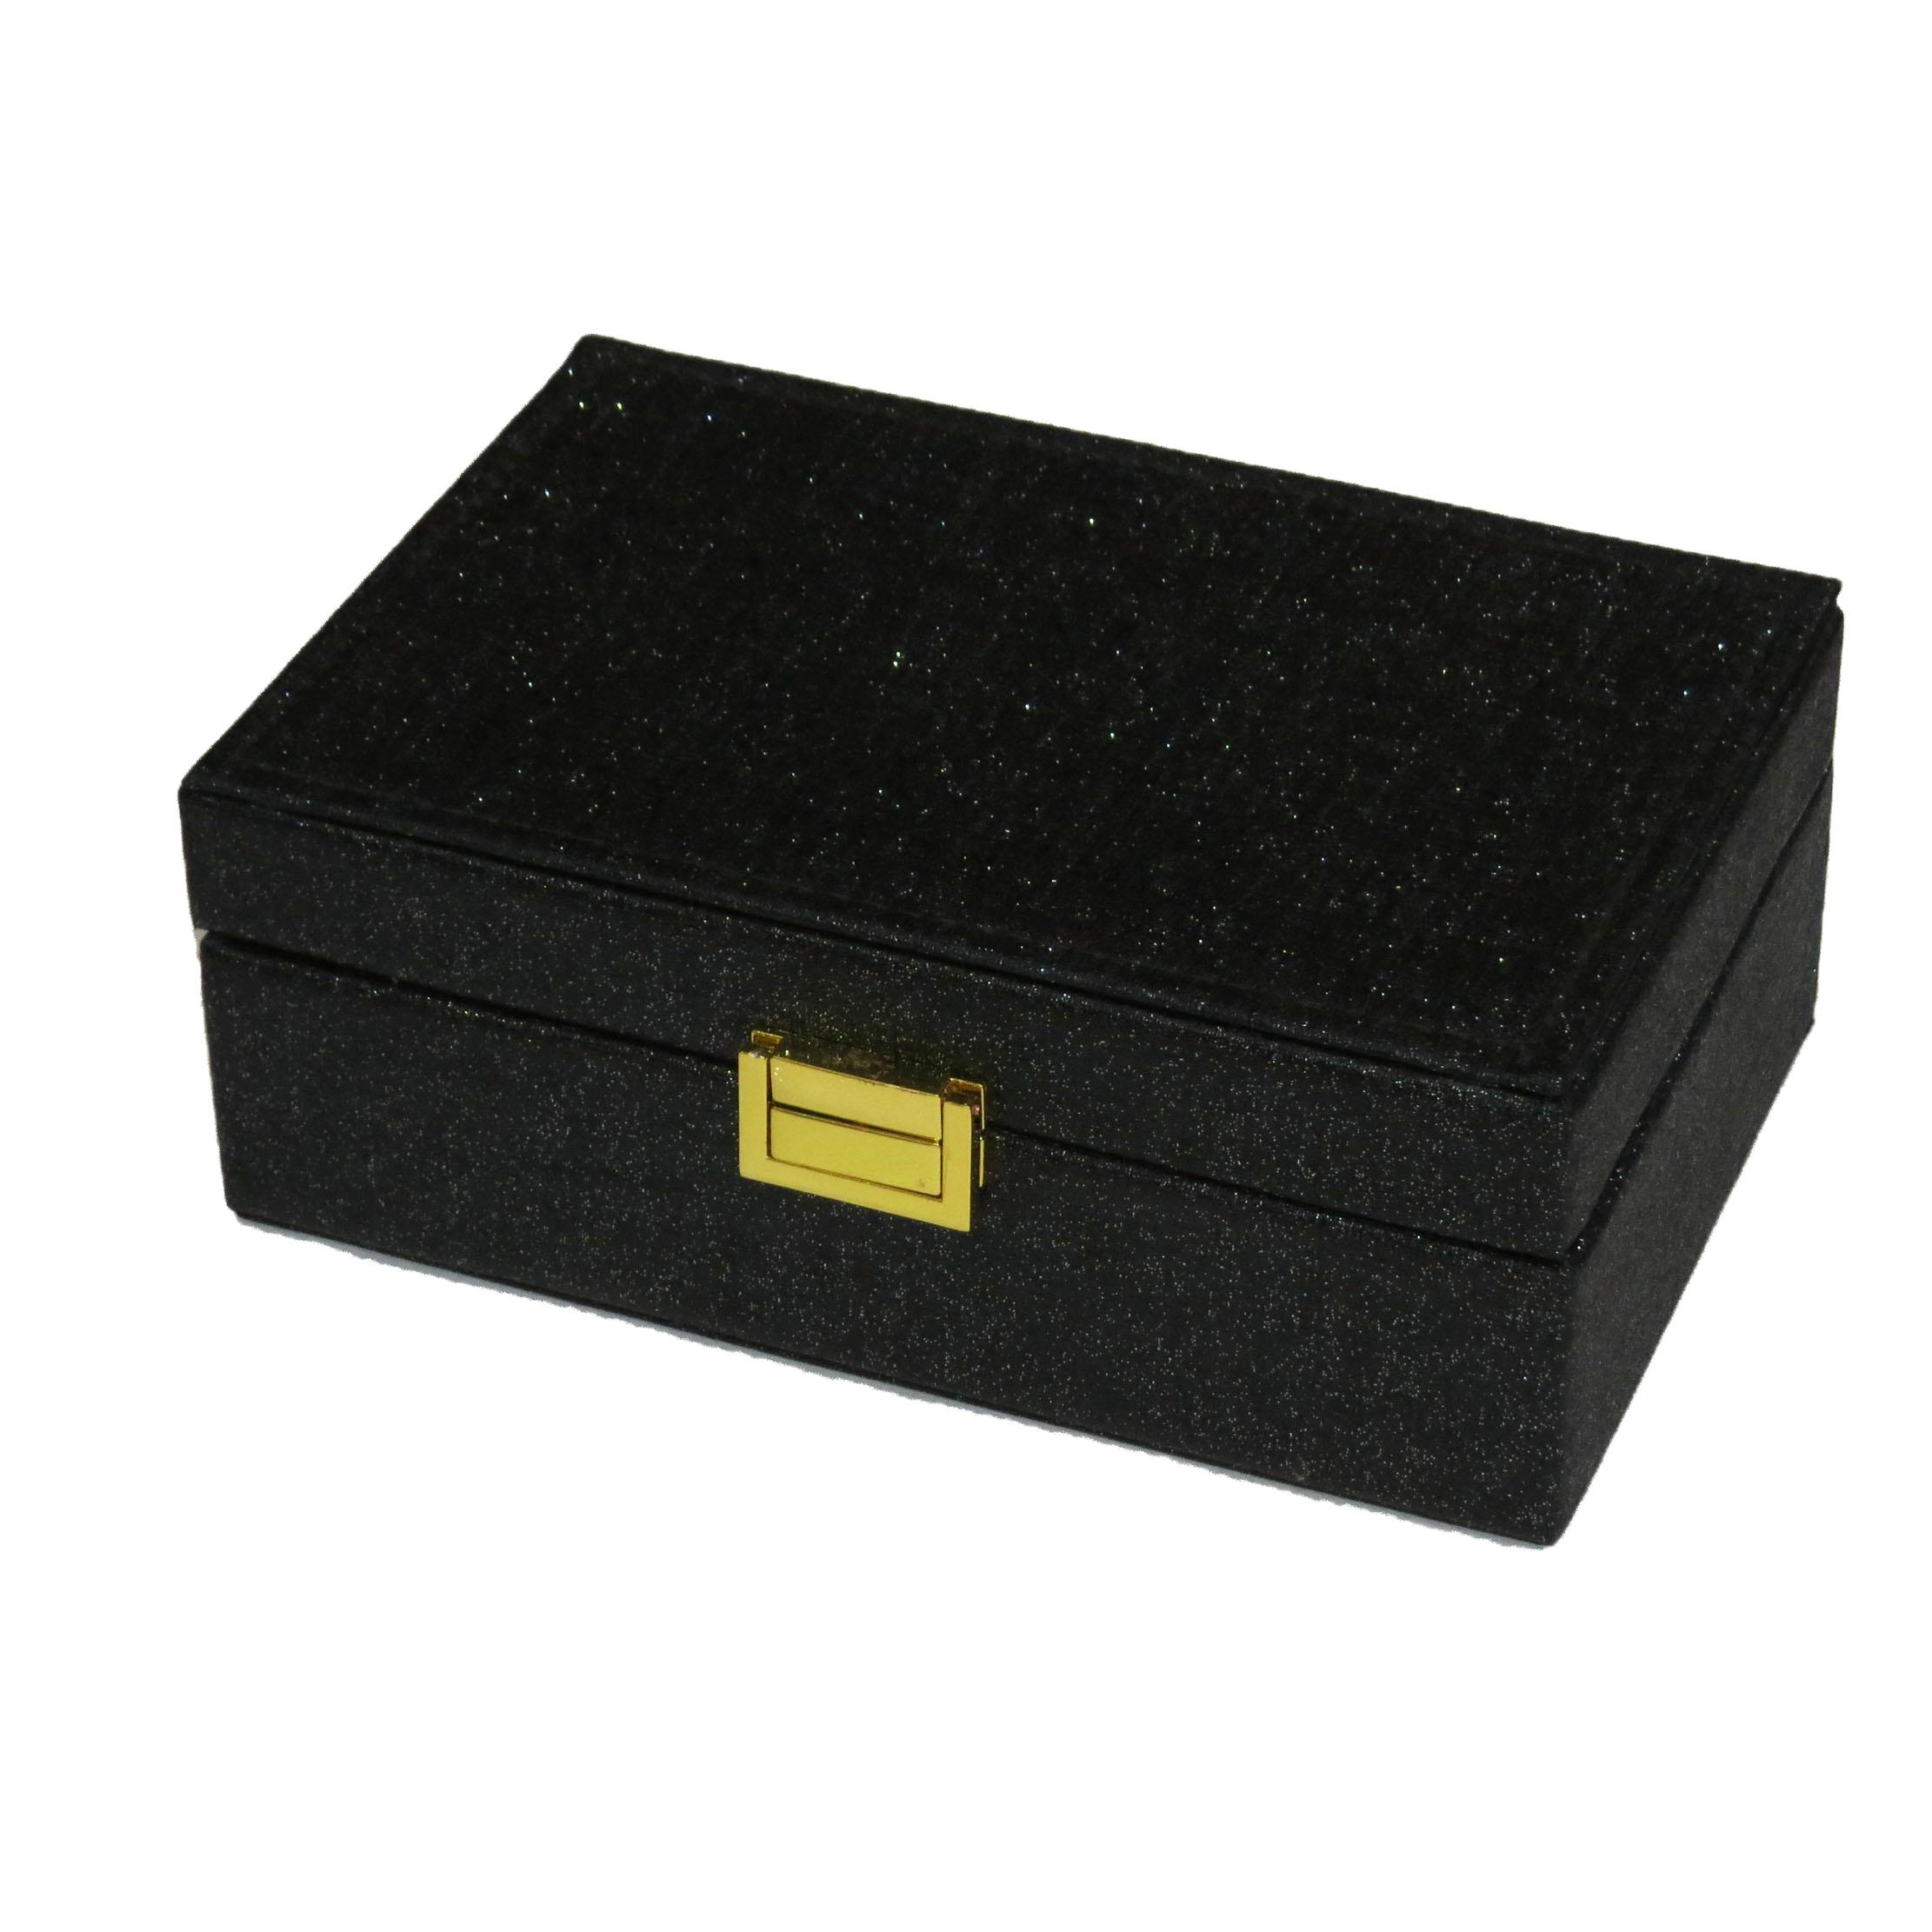 جعبه جواهرات مدل G_Lnd_101